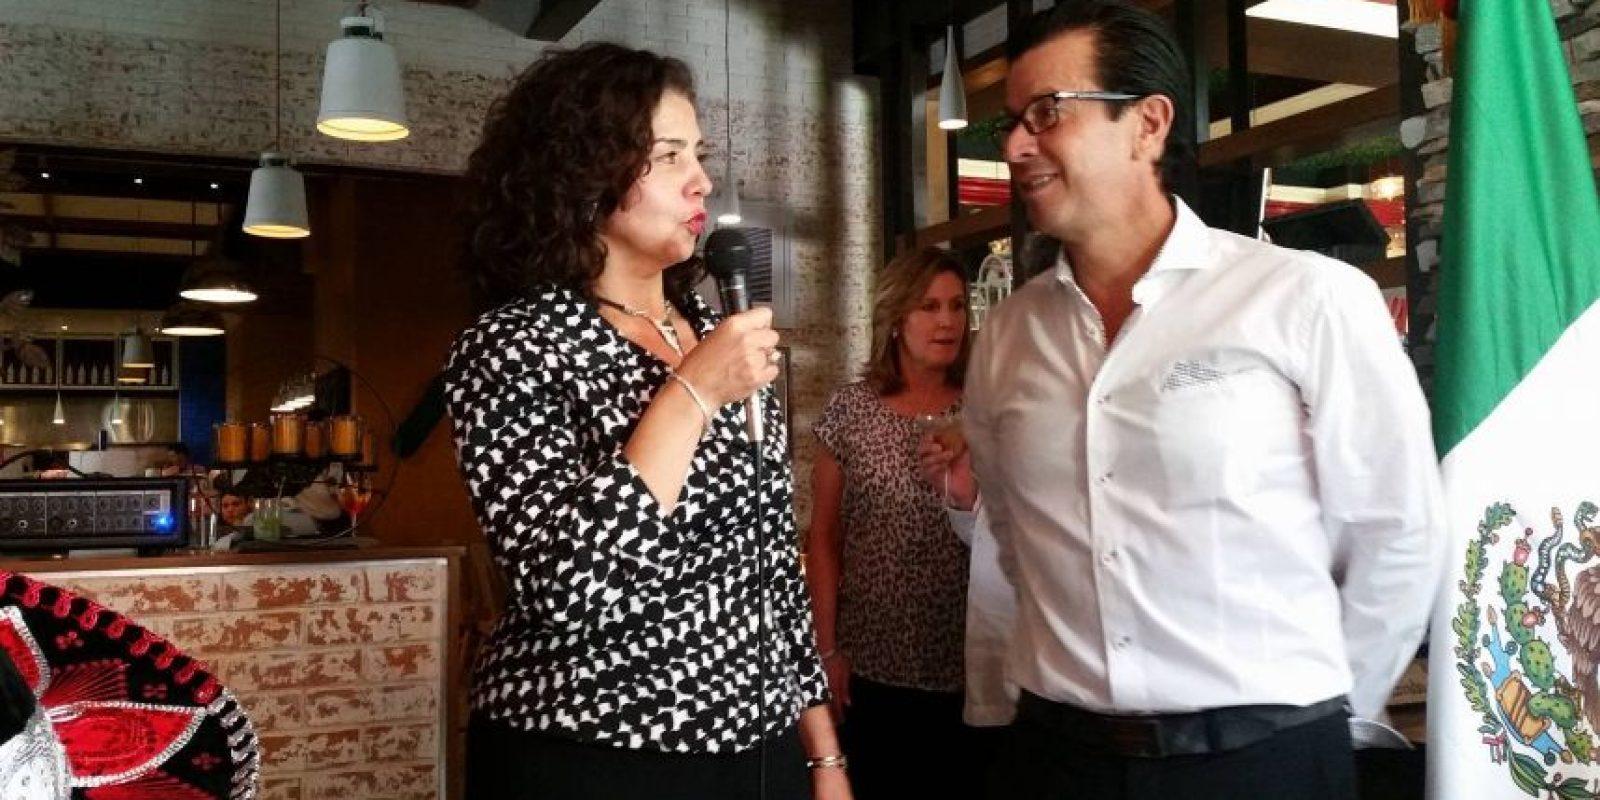 La embajadora mexicana da inicio al Festival. Foto:Publinews